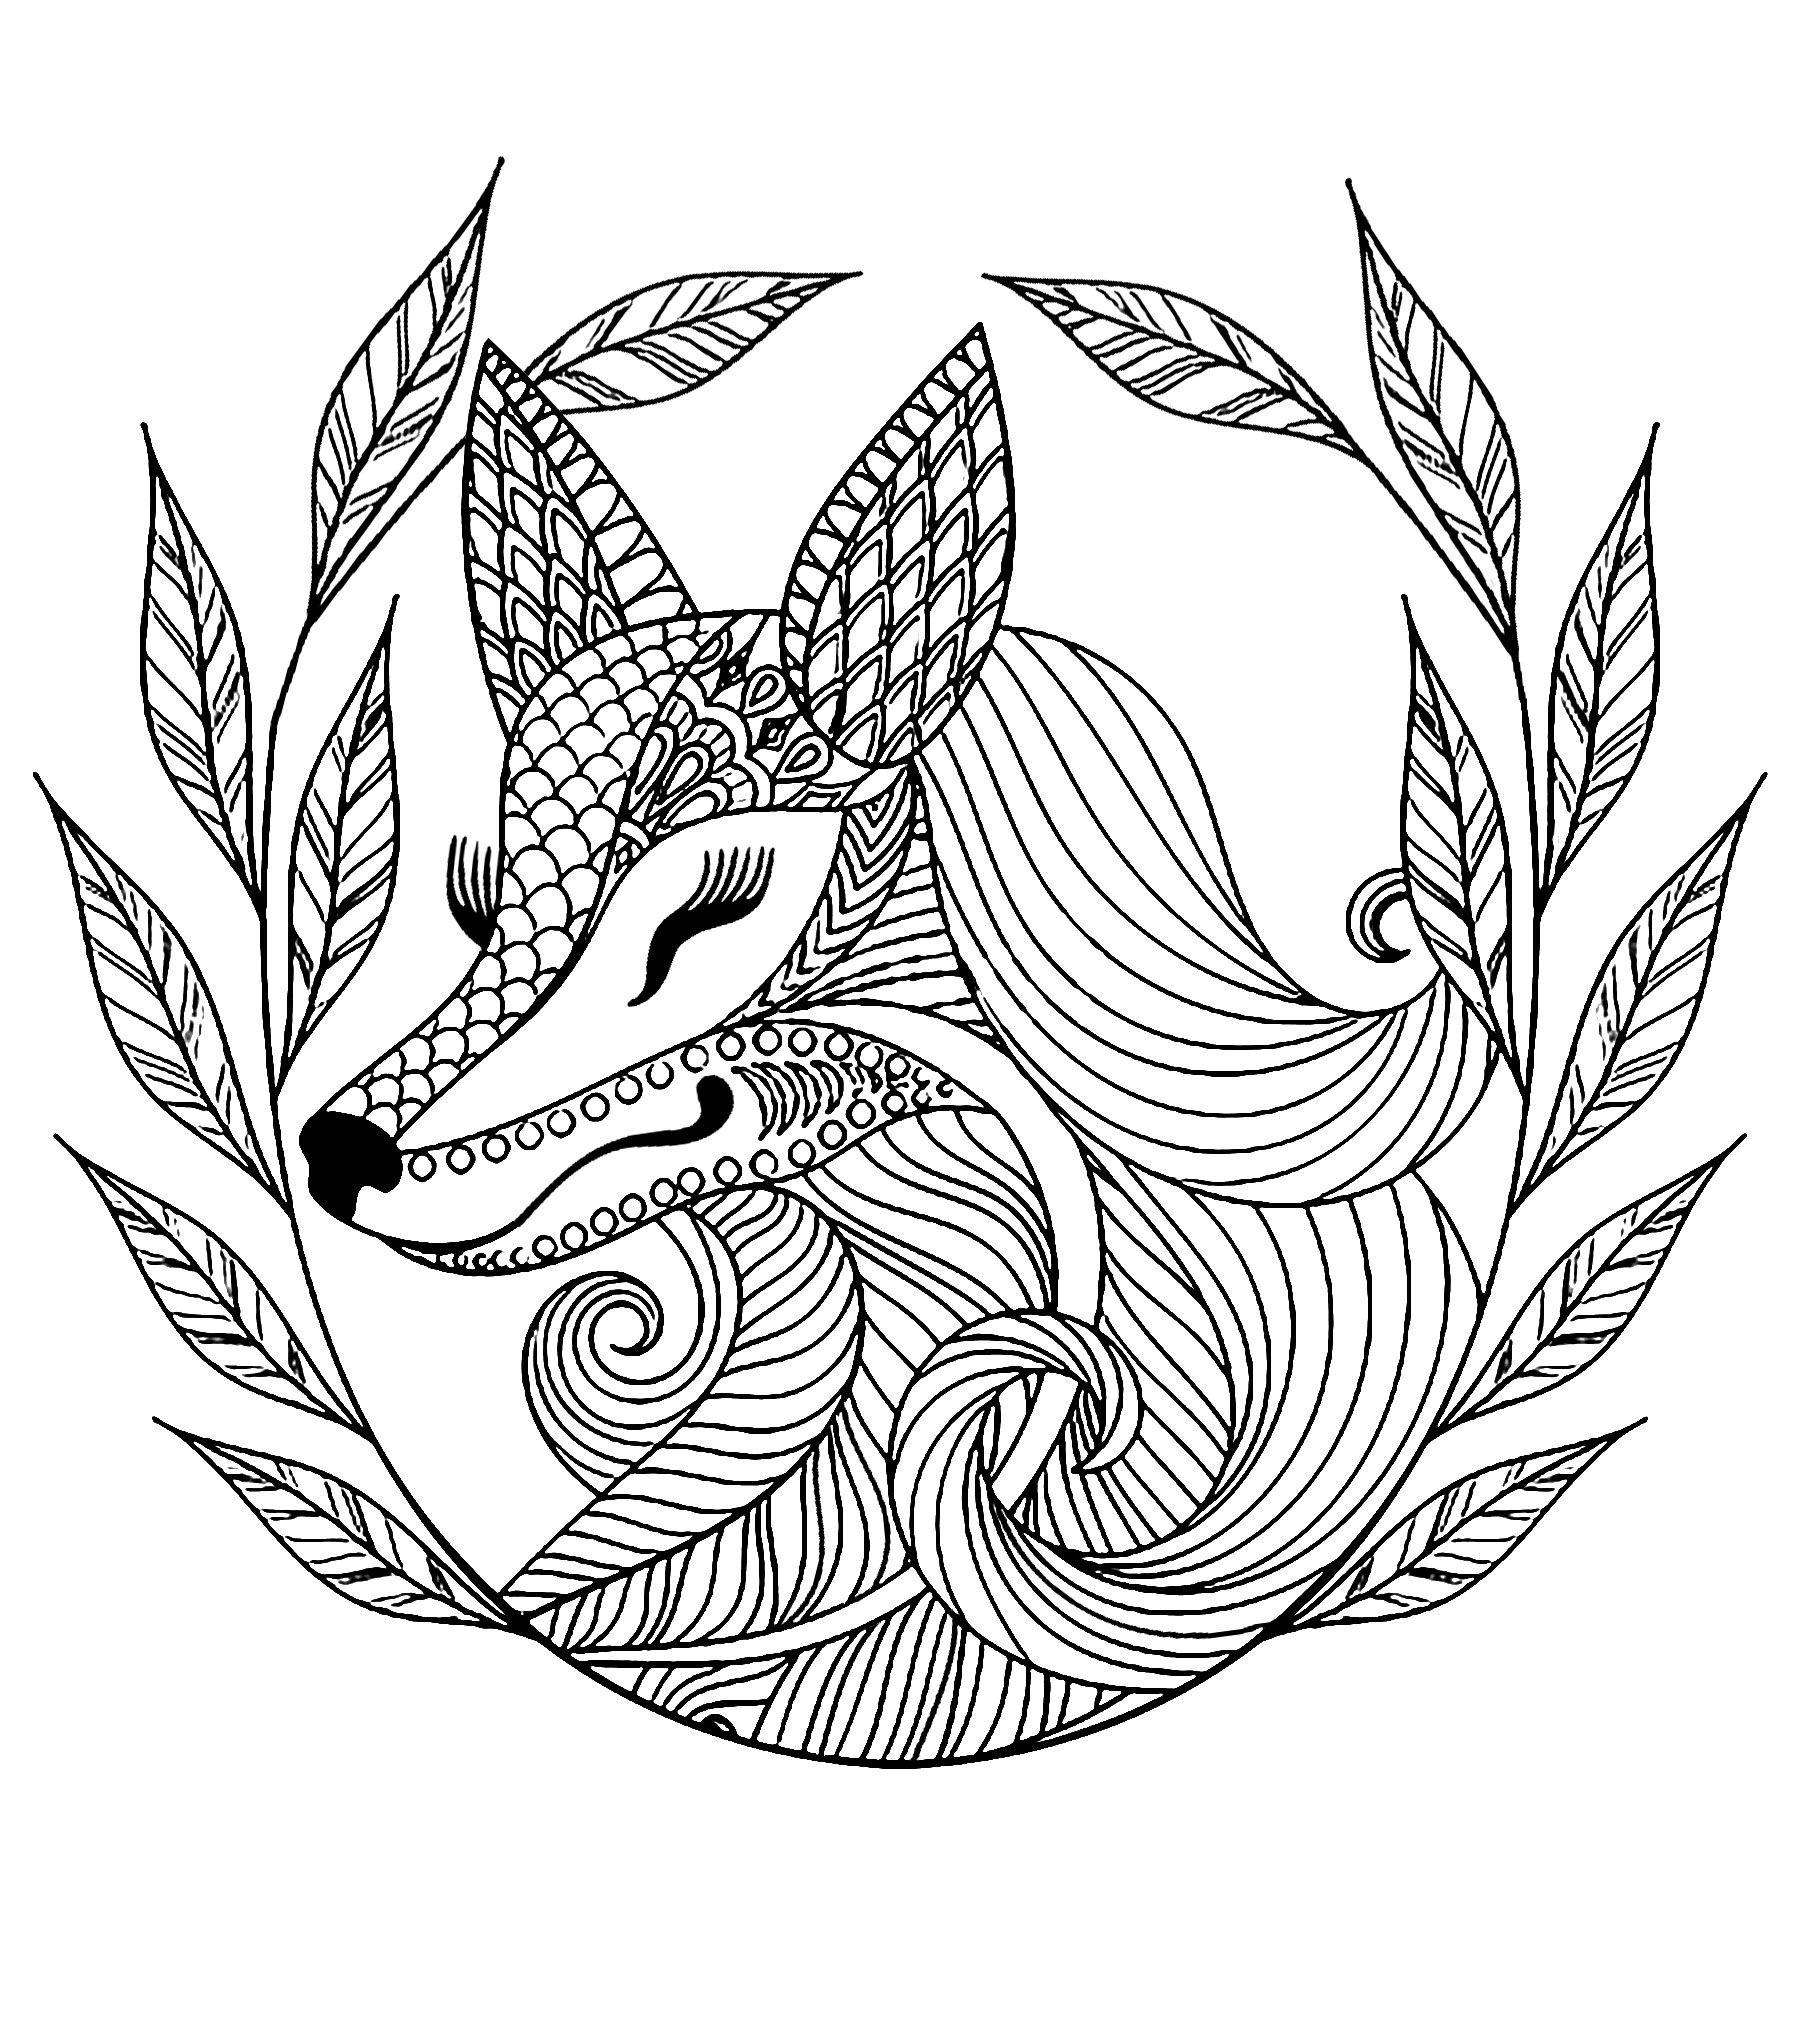 Pin de Kayle Ayers en Adult Coloring | Printables | Pinterest | Animales